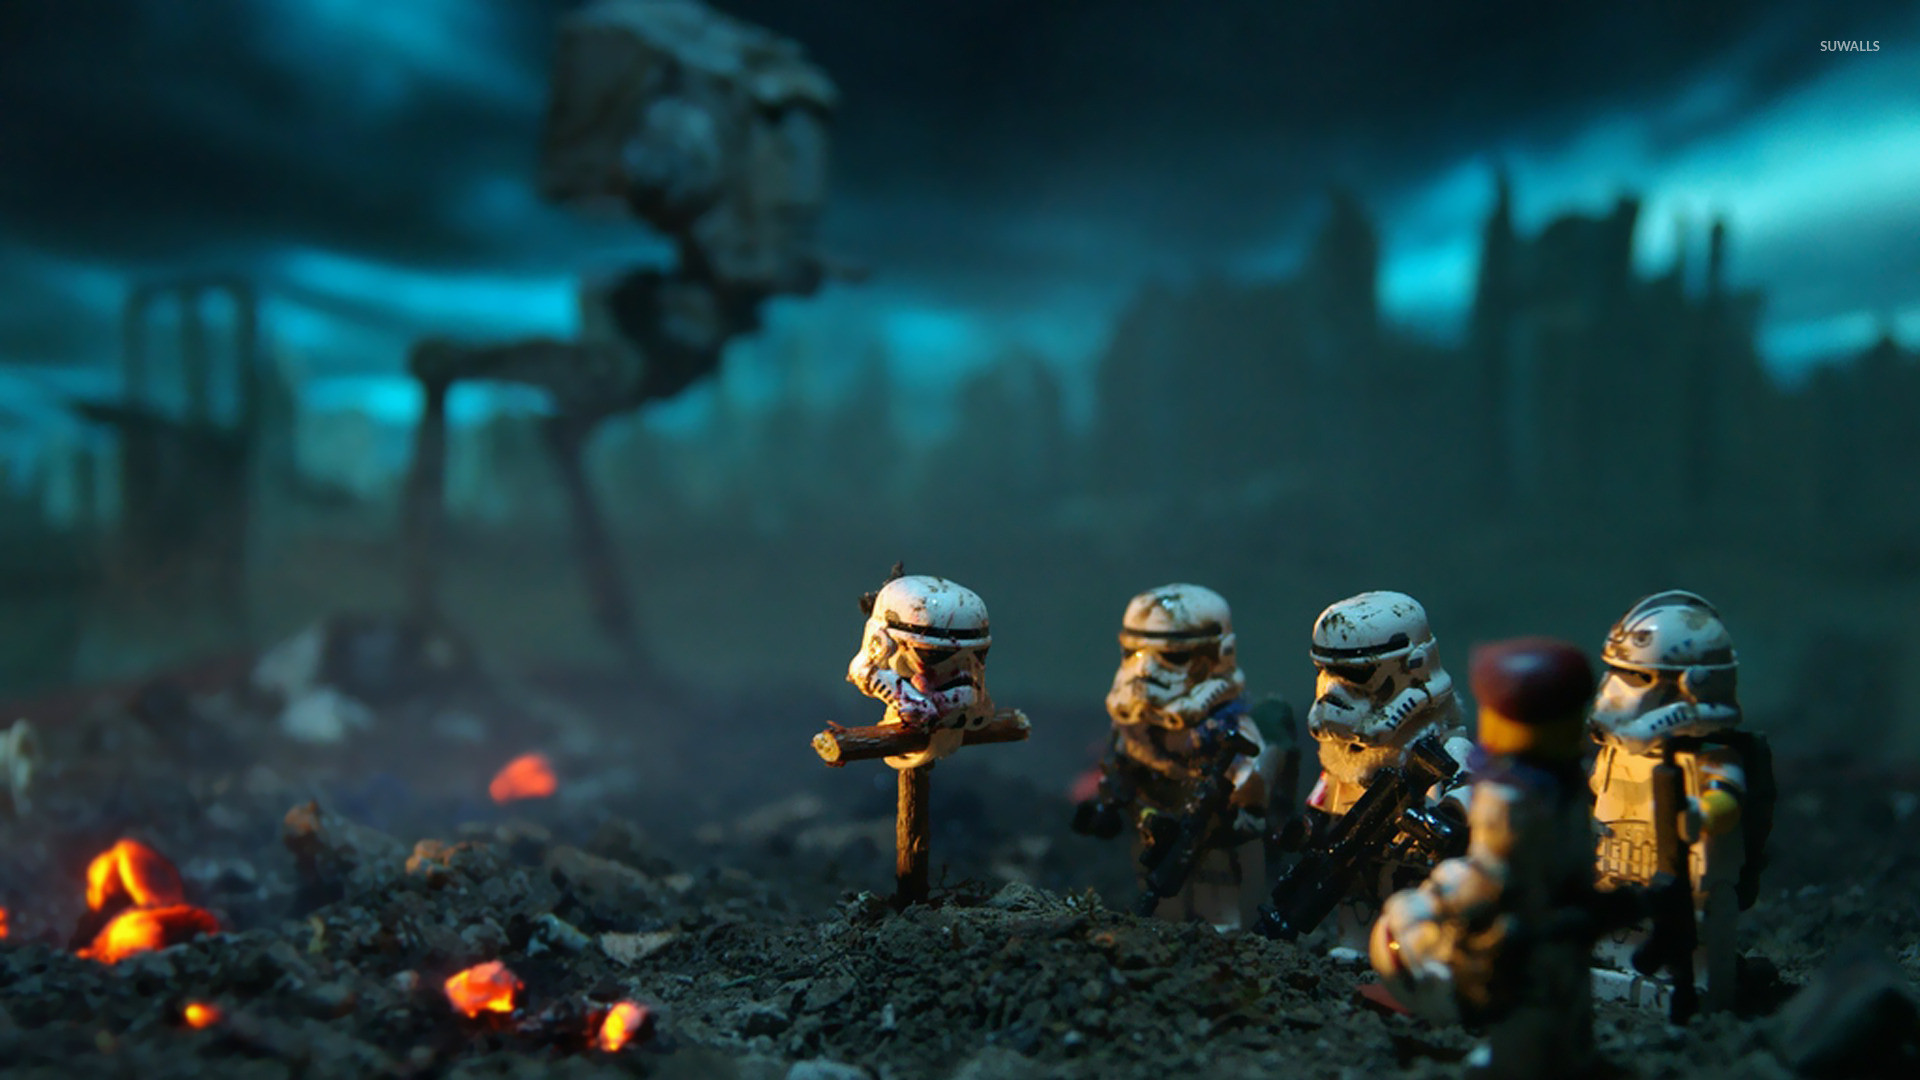 LEGO Stormtrooper burial wallpaper jpg